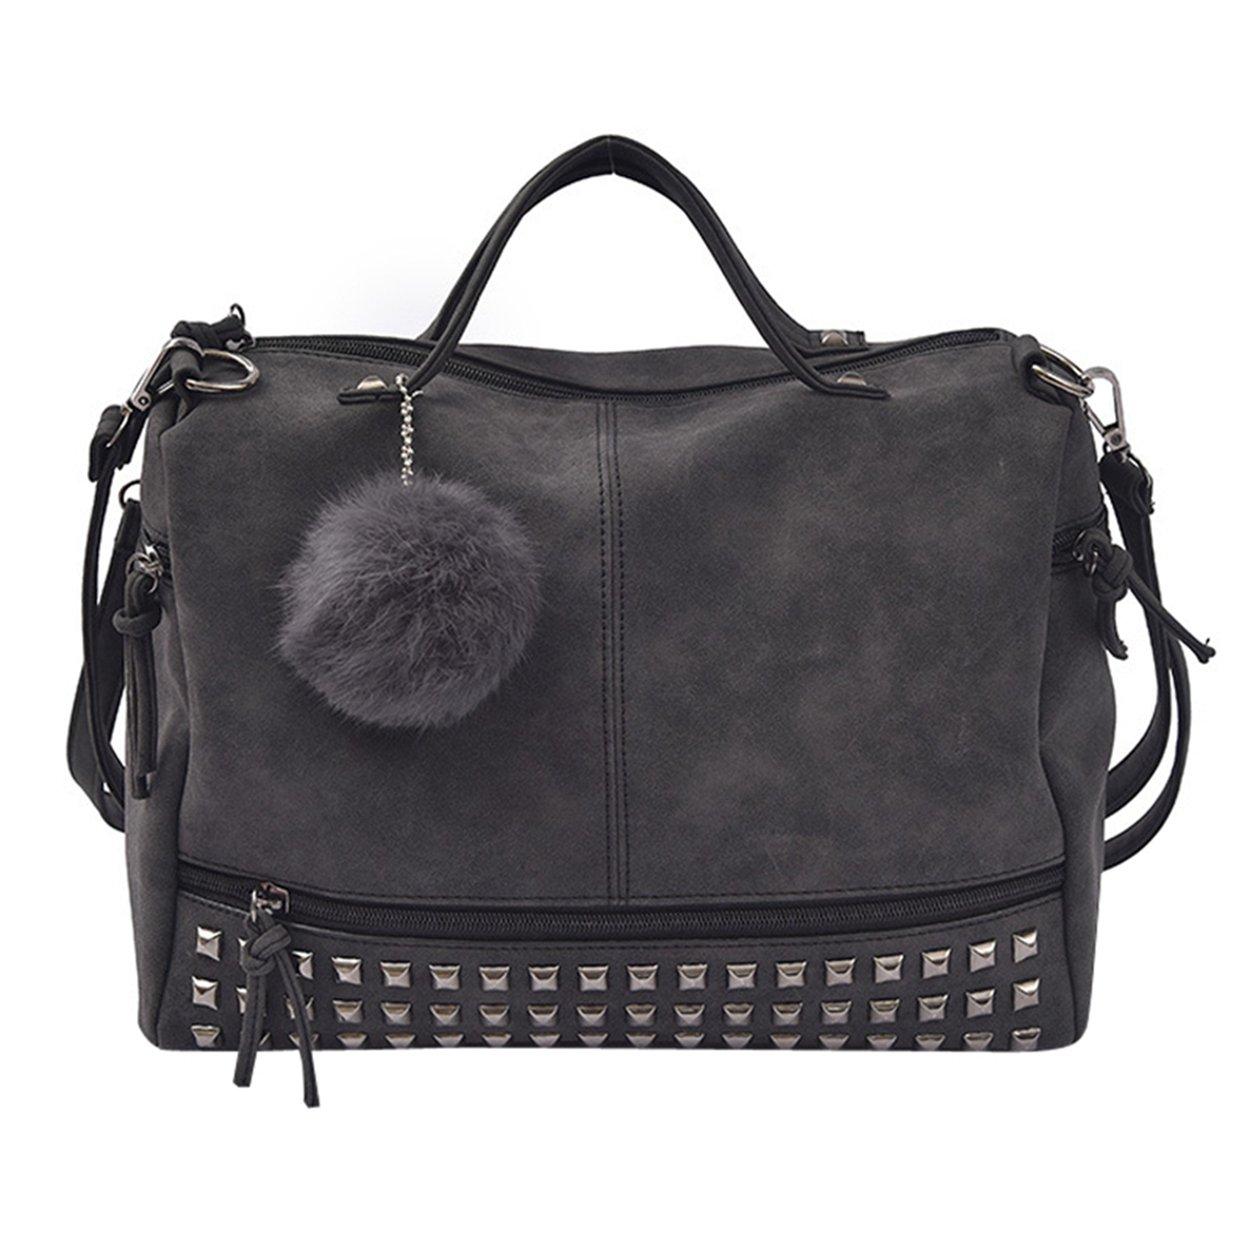 FUNOC Women's Nubuck Top Handle Bag - Satchel Punk Motorcycle Rivet Shoulder Bag (Black)